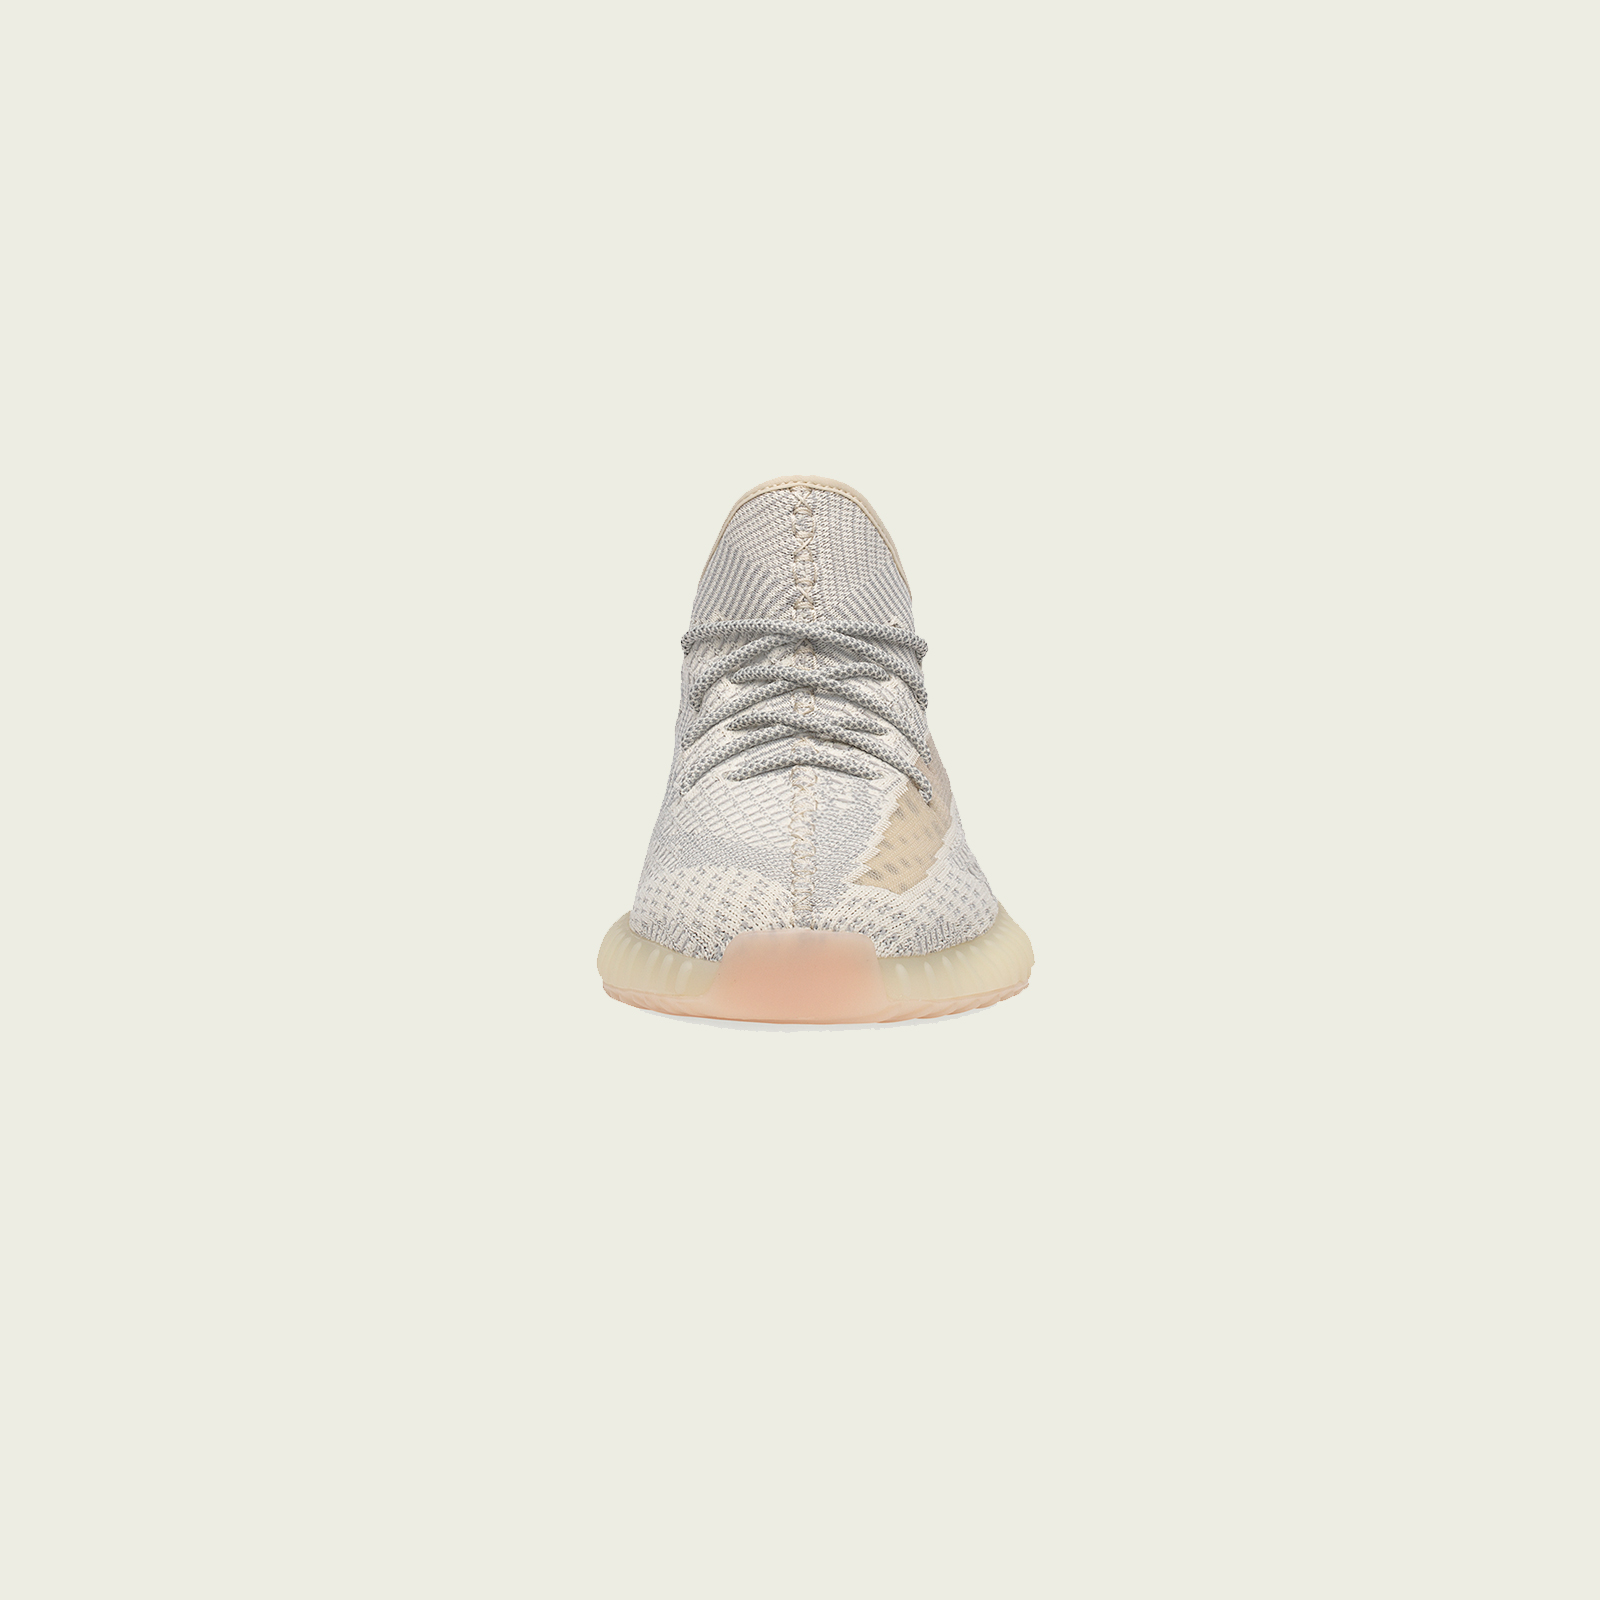 adidas Yeezy Boost 350 V2 Fu9161 Sneakersnstuff